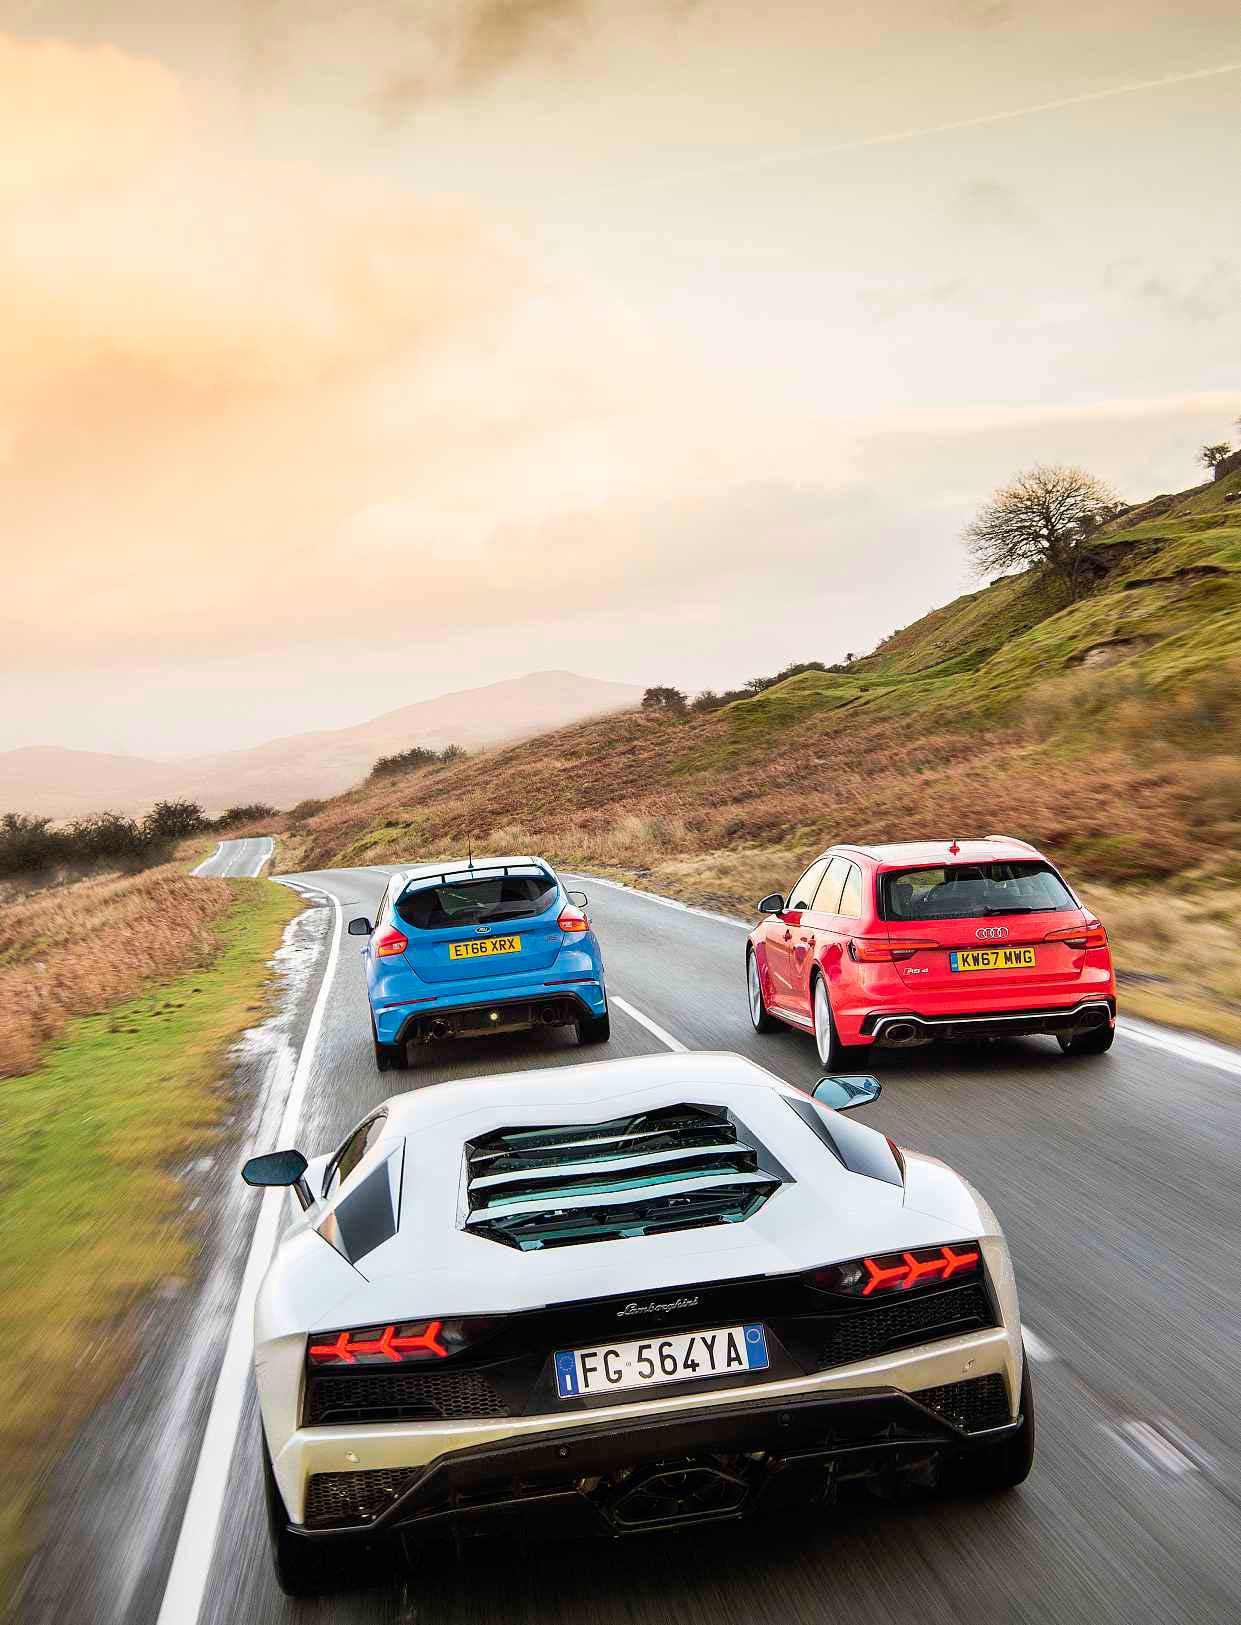 Mercedes-AMG E63 S W213 vs. Lamborghini Aventador S, Ford Focus RS MkIII C346-Type, Audi RS4 B9 Type 8W, Audi S1 Type 8X, Honda NSX MkII